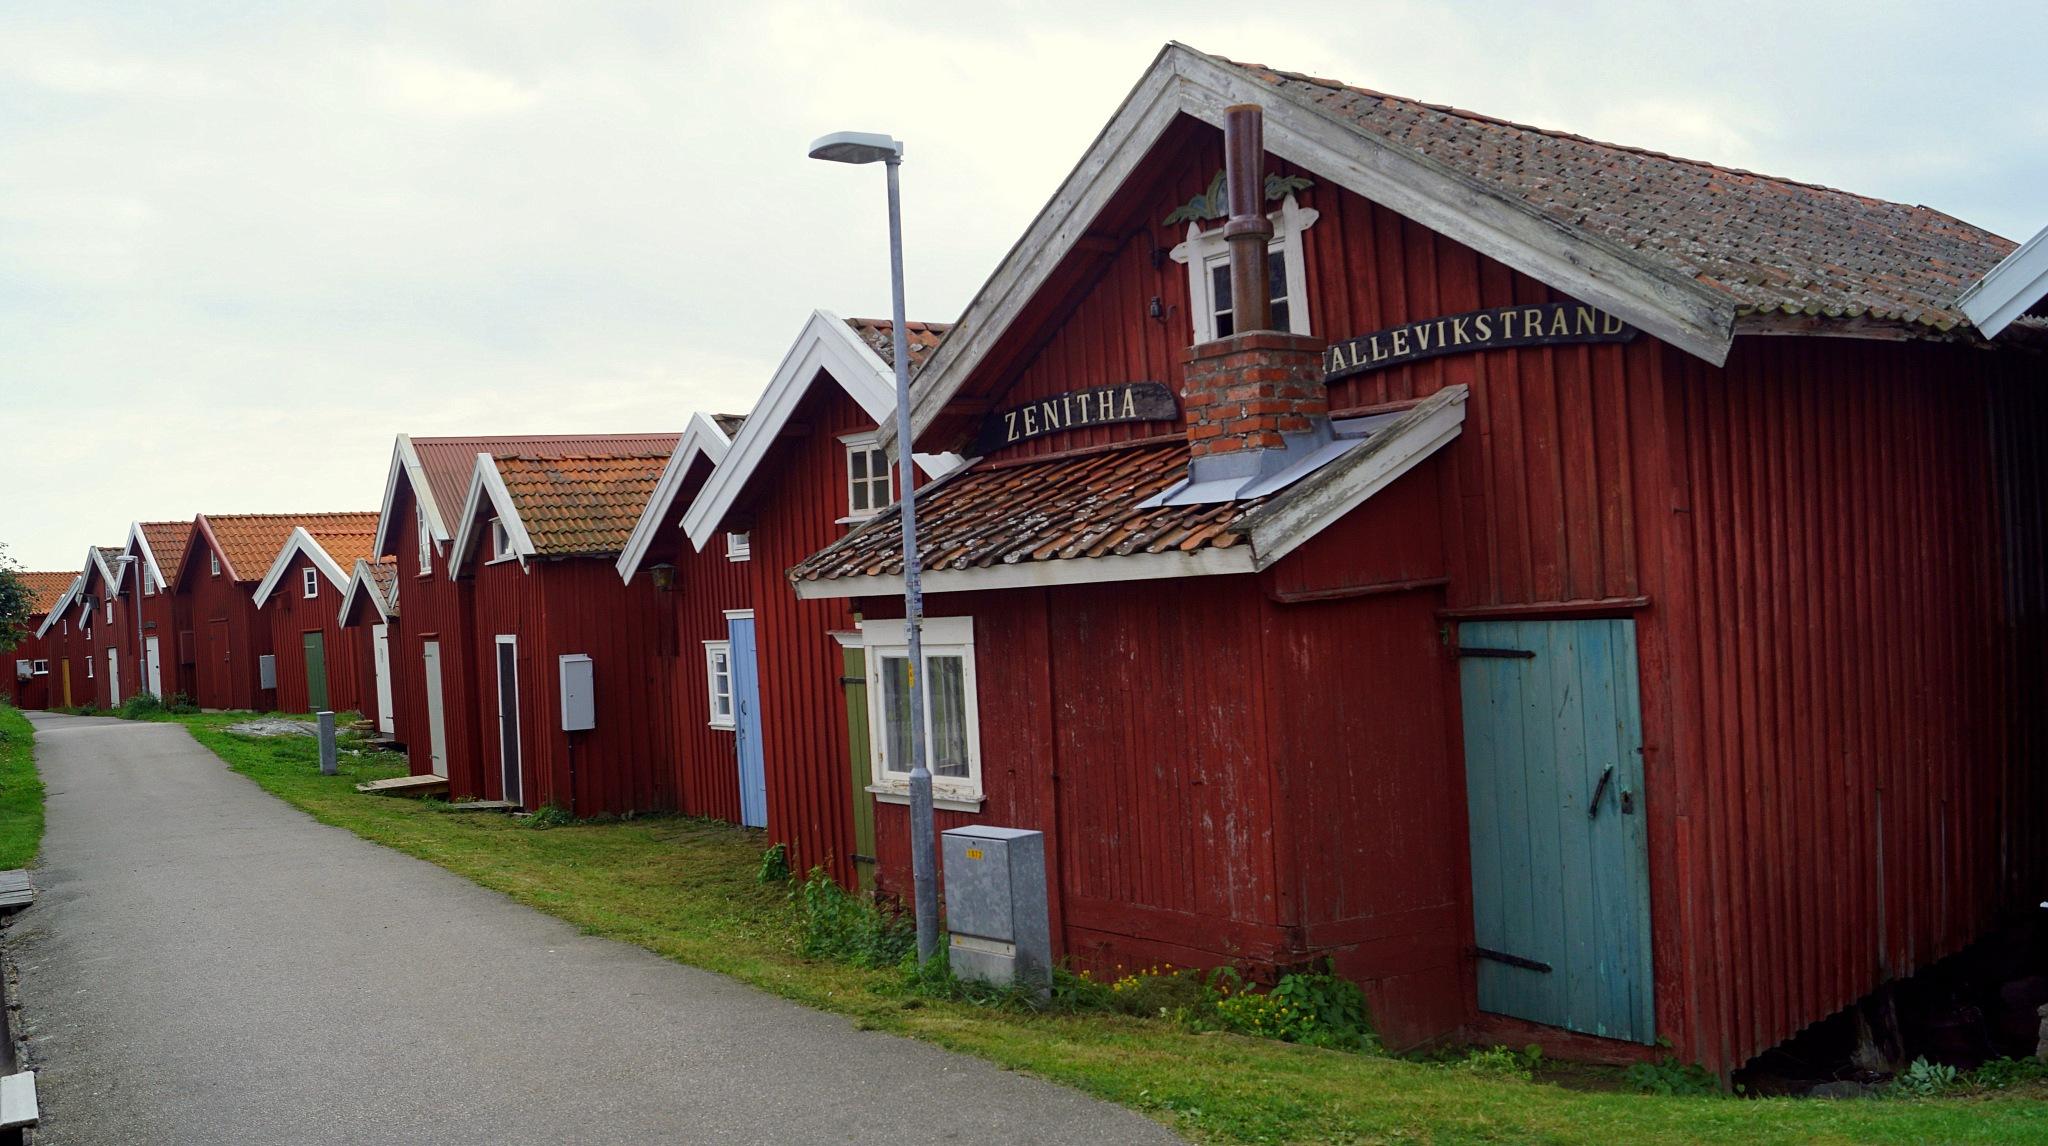 Fishingcottages by susannemkarlsson